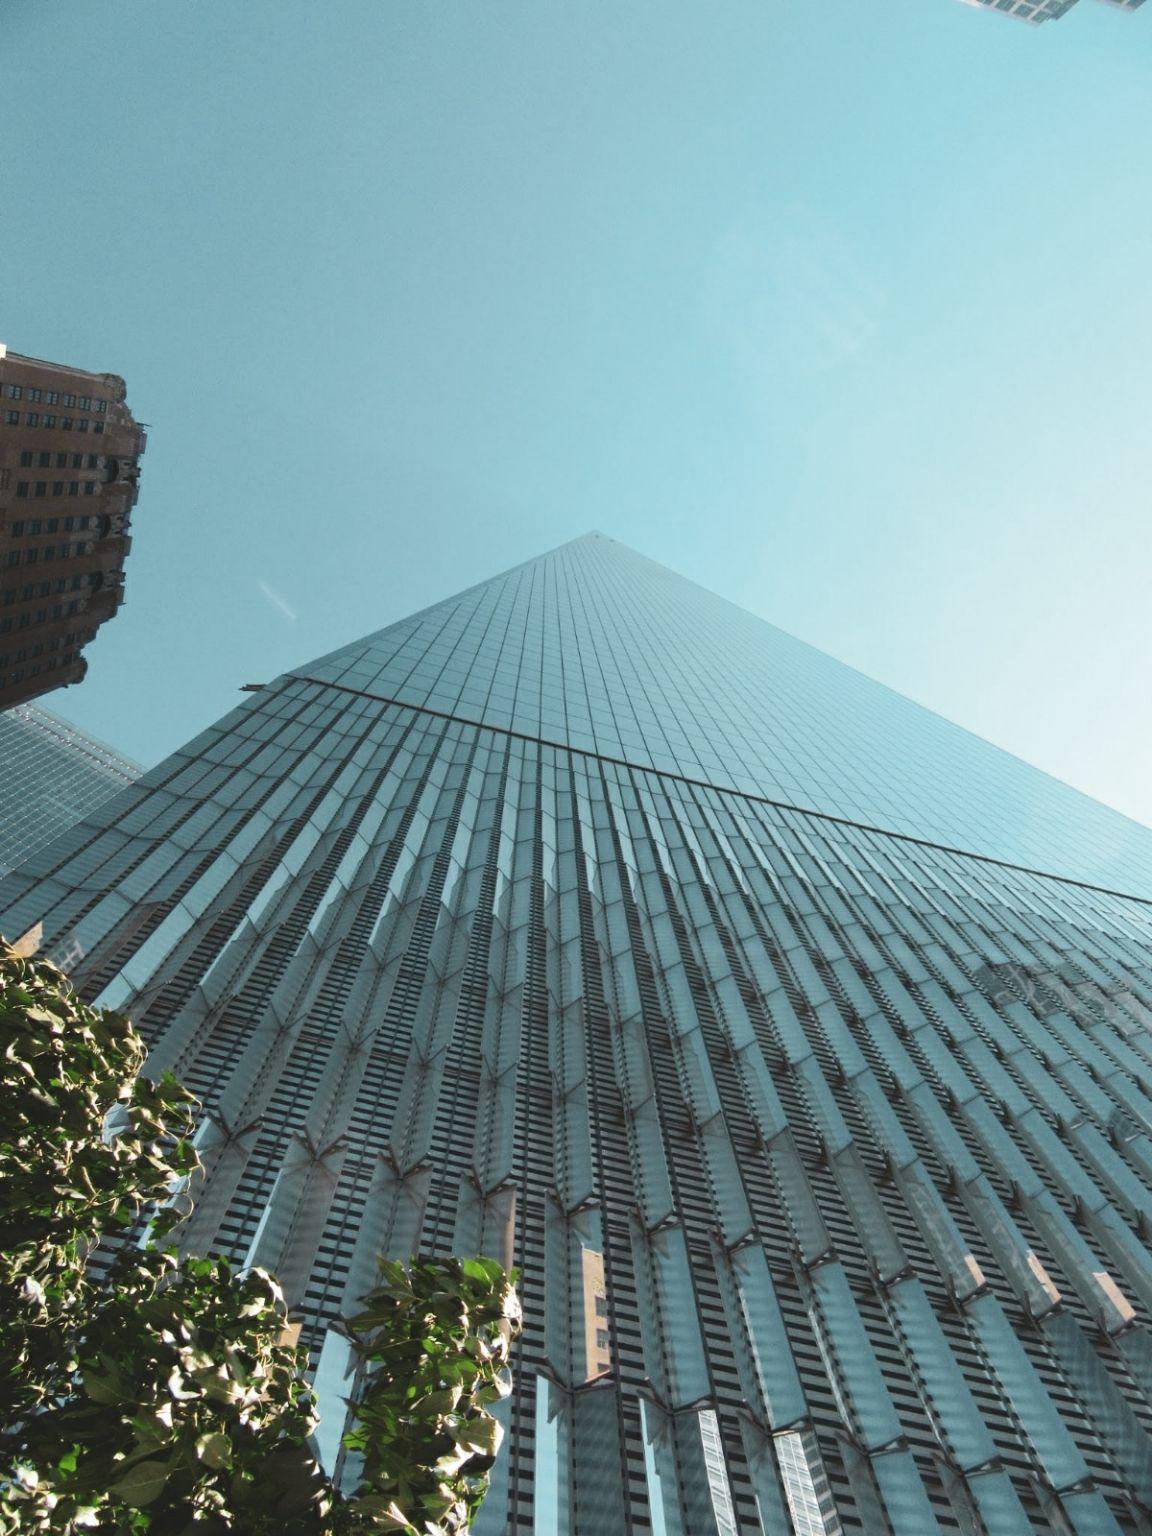 Photo of Freedom Tower By Sitikshu Badani